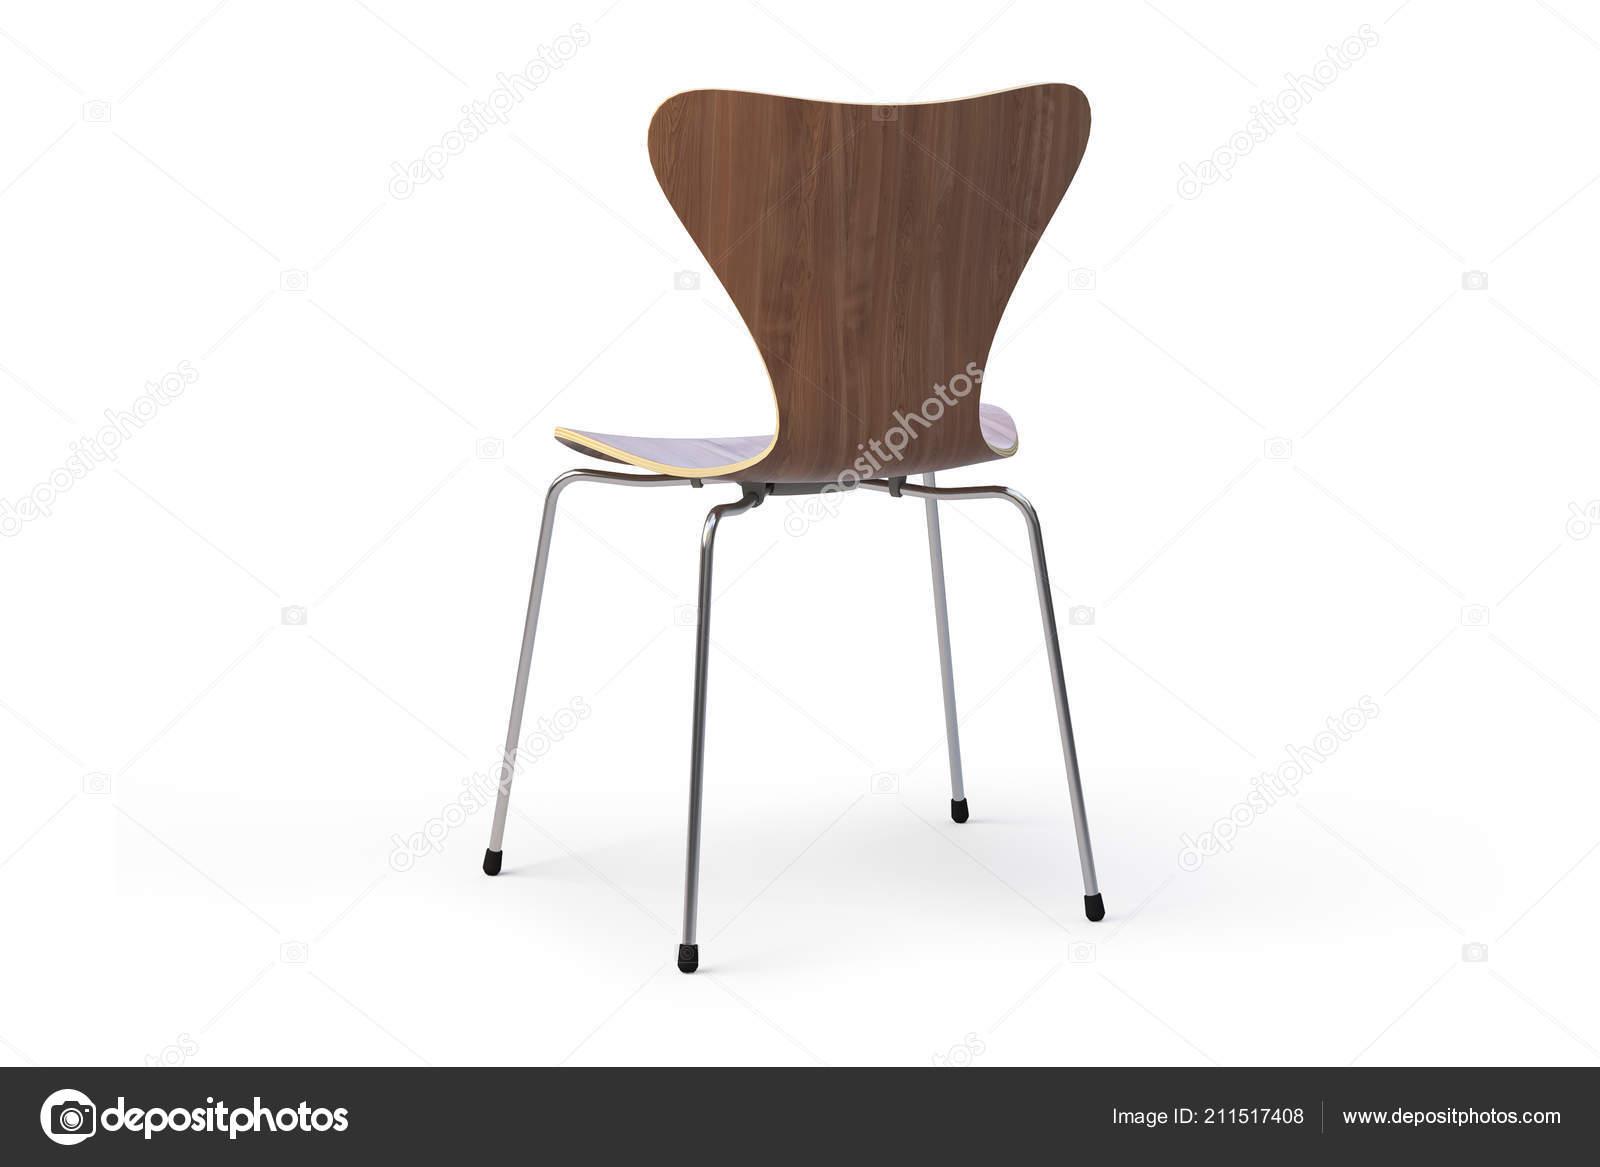 Phenomenal Modern Wooden Chair Metal Legs Modern Chair White Background Squirreltailoven Fun Painted Chair Ideas Images Squirreltailovenorg